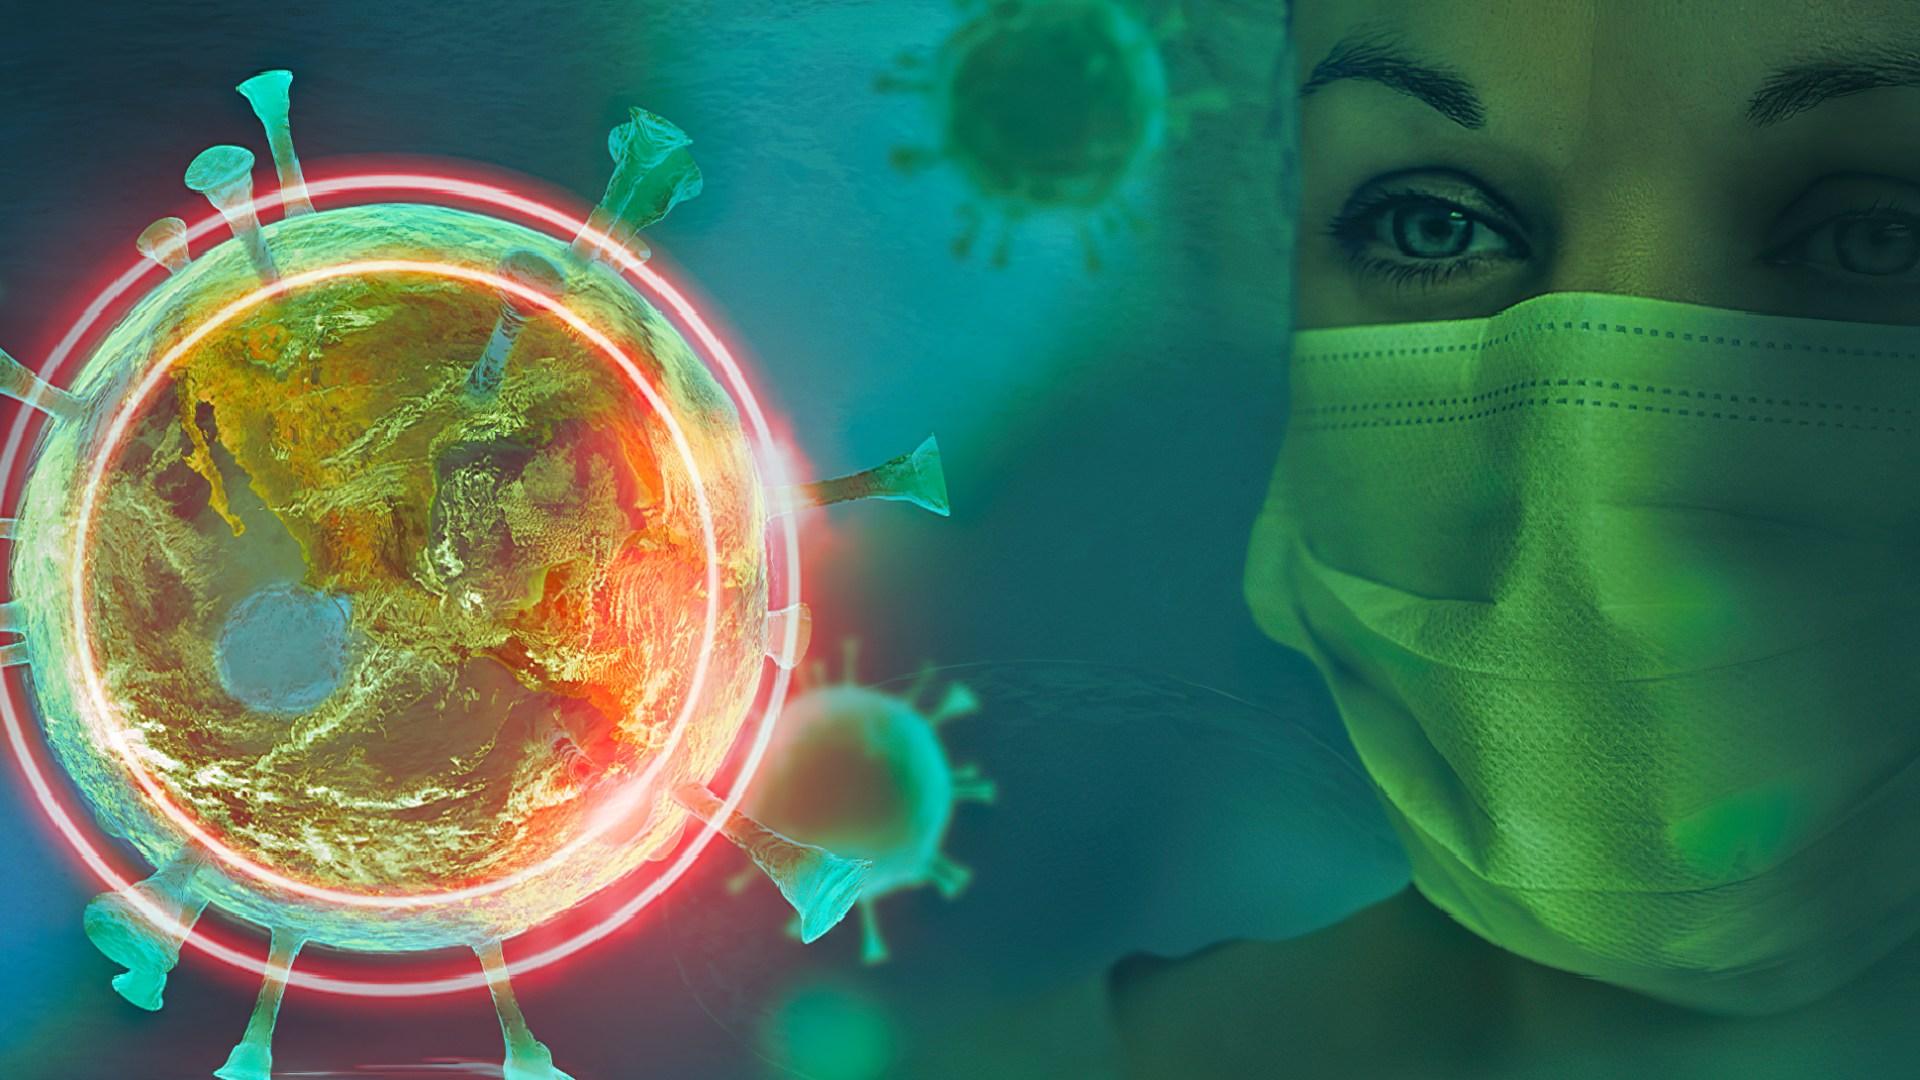 Virus, Coronavirus, Corona, Covid-19, Coronakrise, Forscher, BioWare, SARS-CoV-2, Corona-Virus, Pandemie, Covid-2019, Biologie, Covid, Covid-19-Tracker, Biohacking, Covid19, Krank, Zelle, Grippe, Erkrankung, Viruszelle, Pandemic, SARS